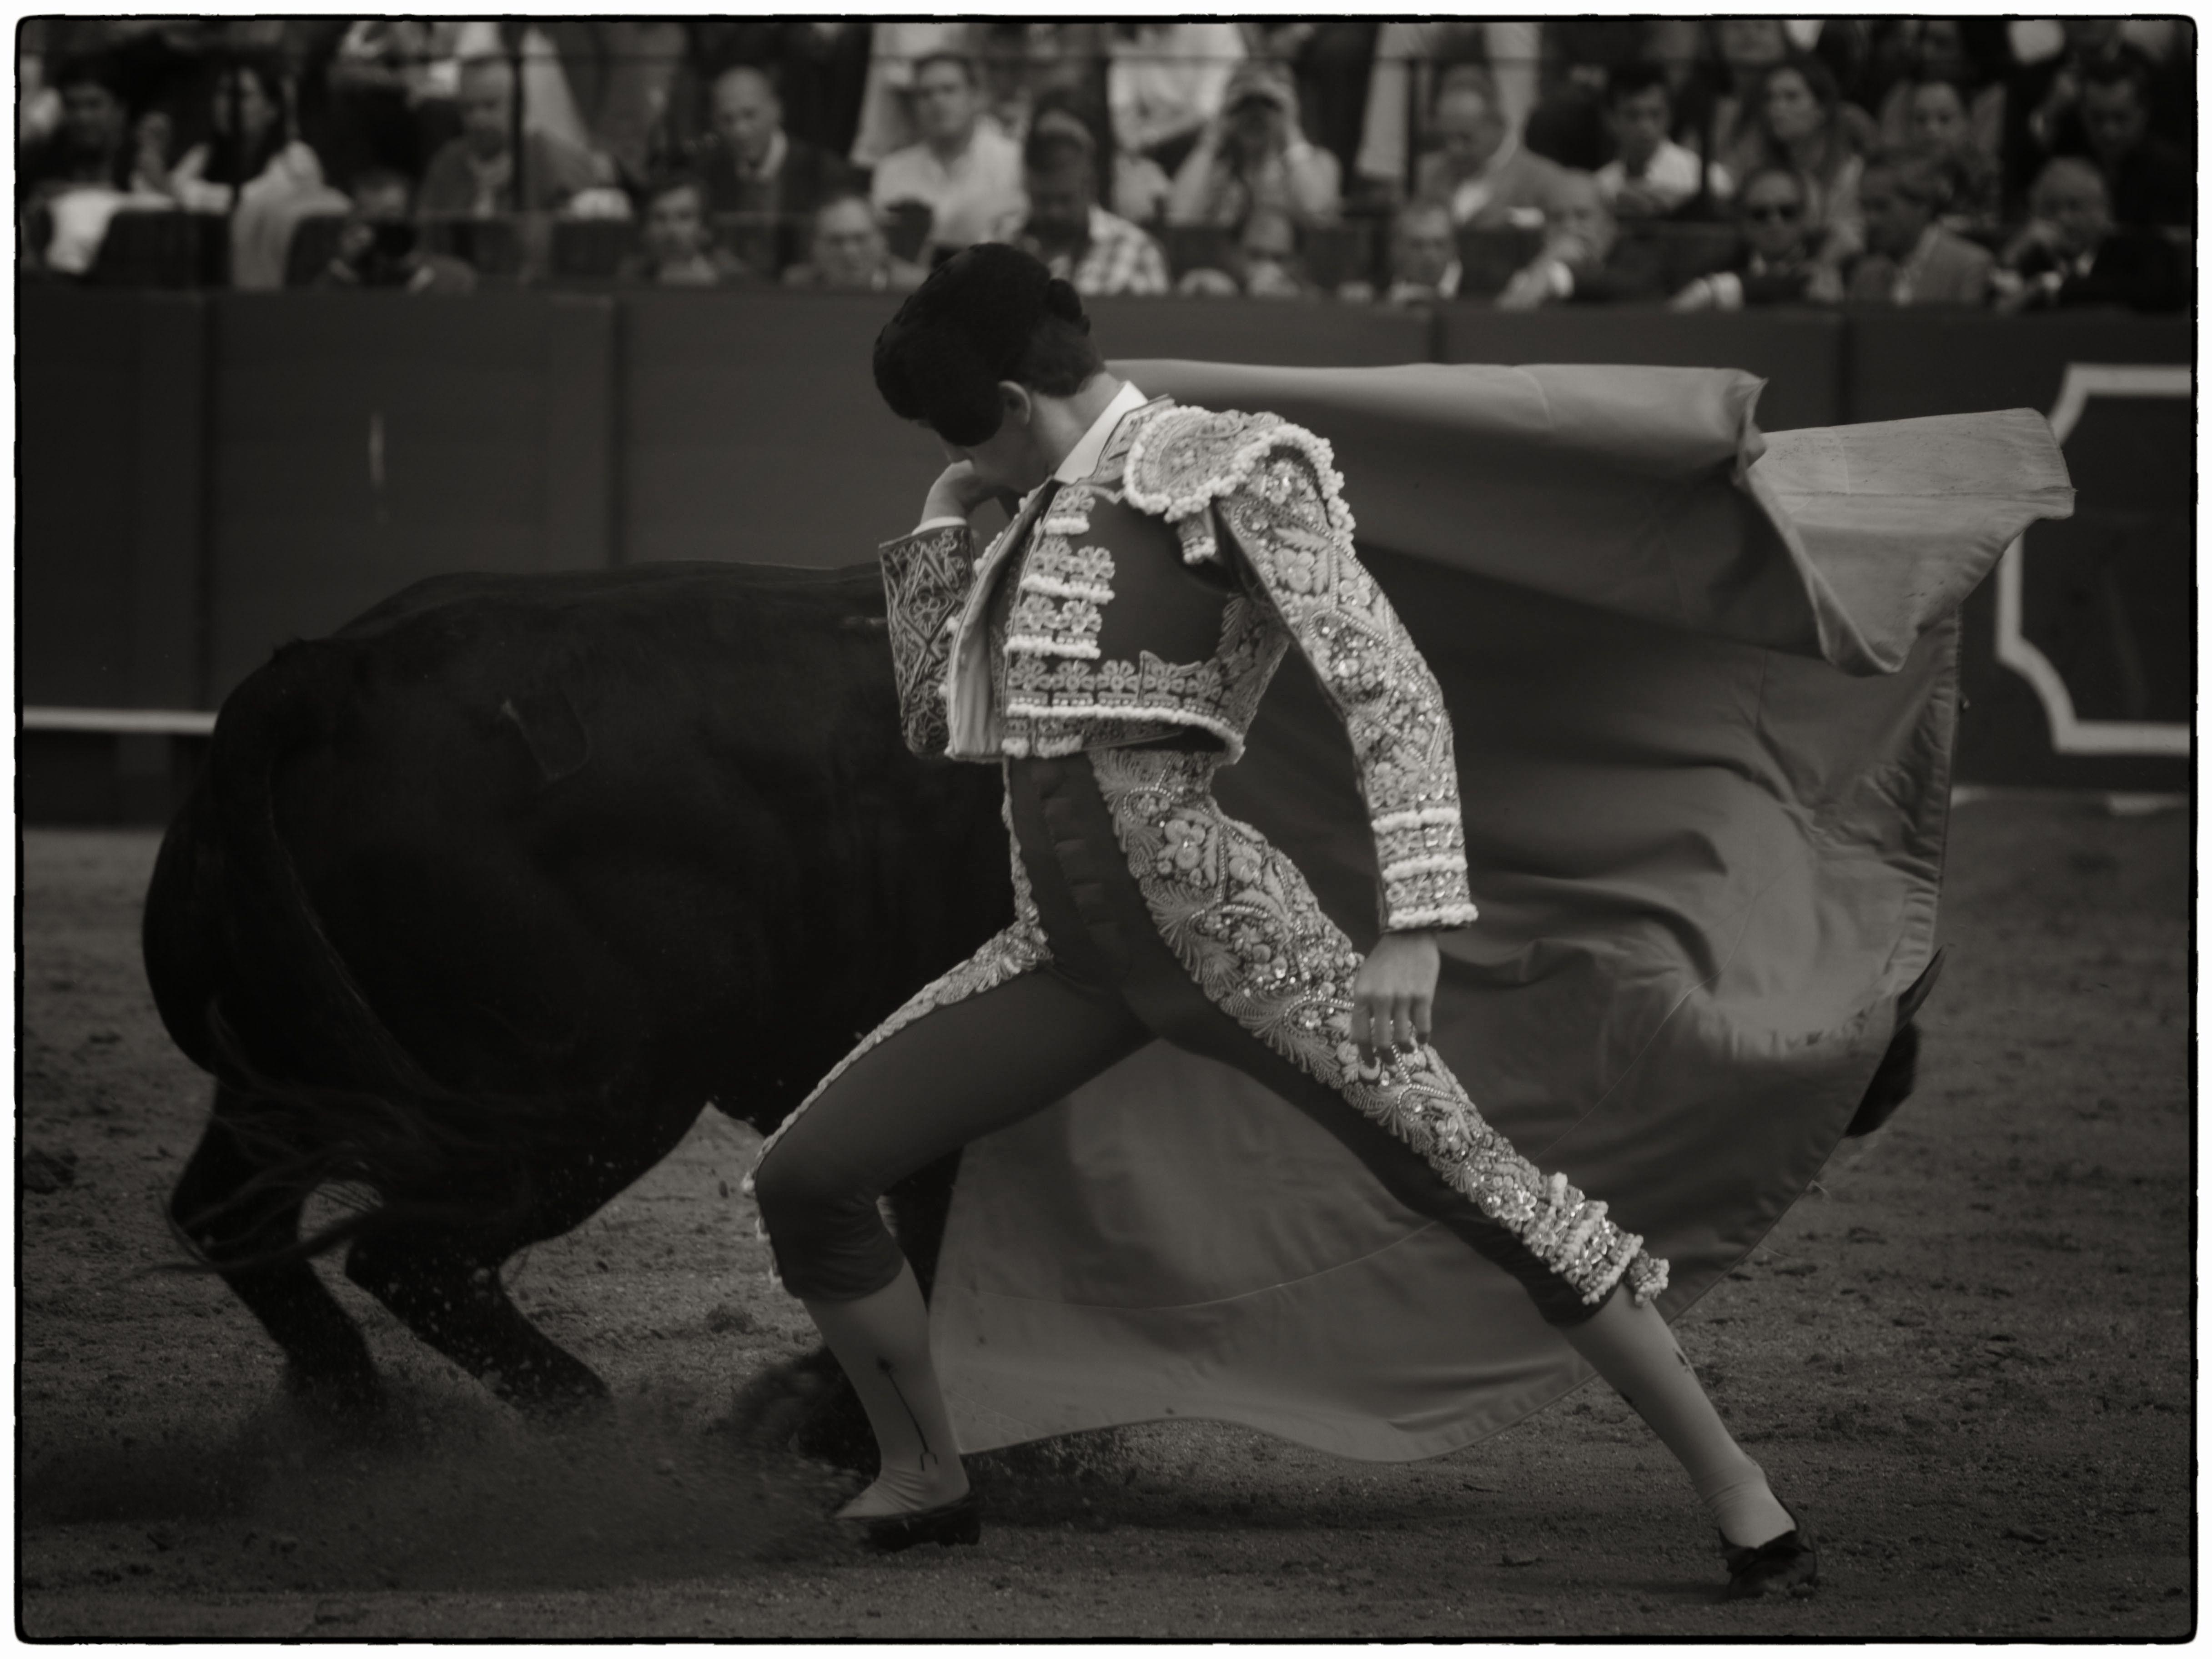 CRÓNICA FOTOGRÁFICA DE MAURICE BERHO